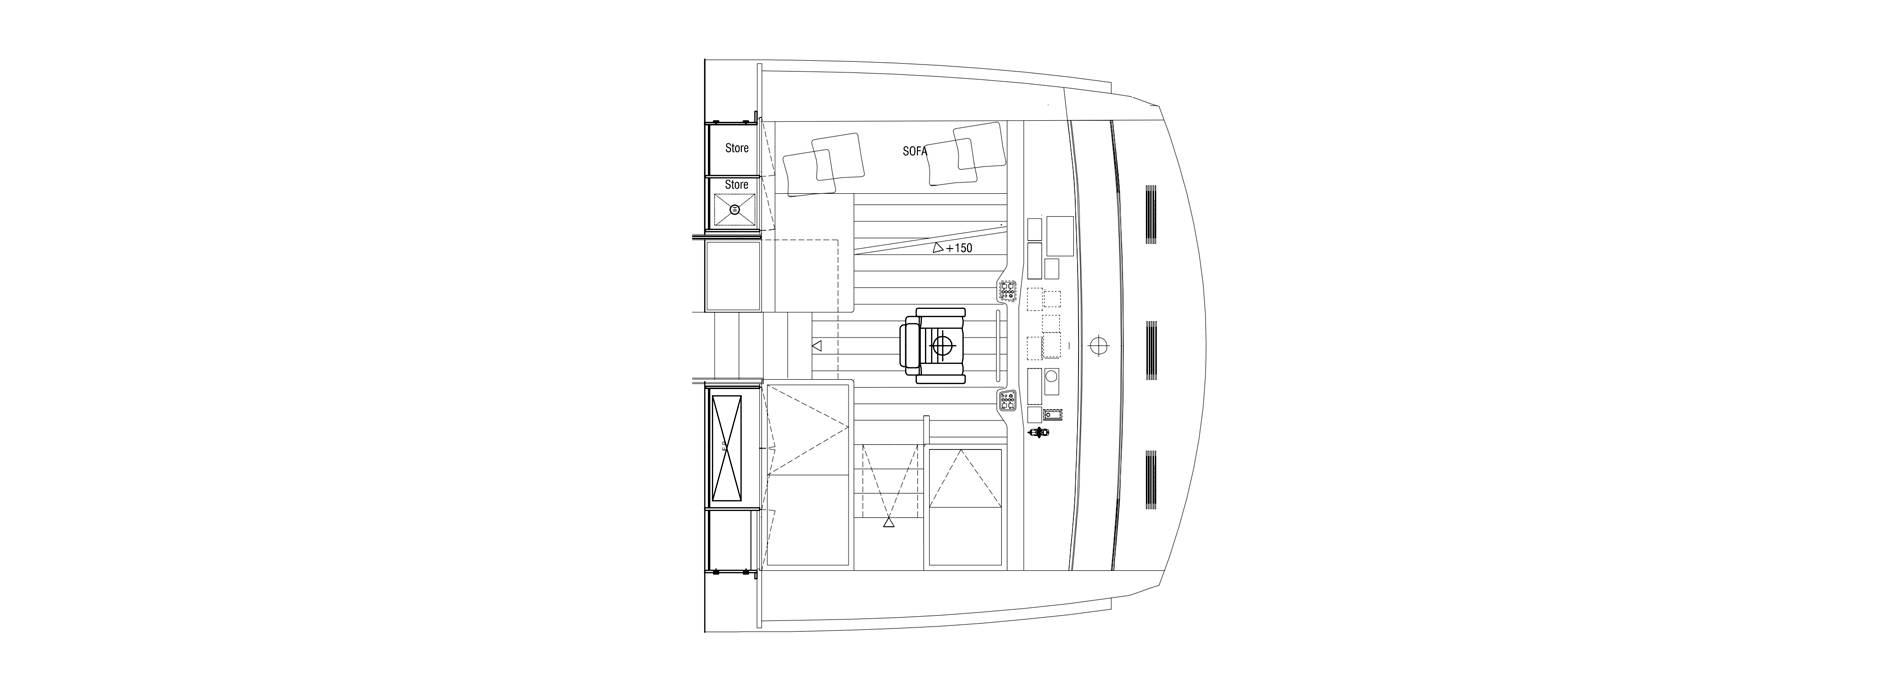 Sanlorenzo Yachts SL96-635 Details